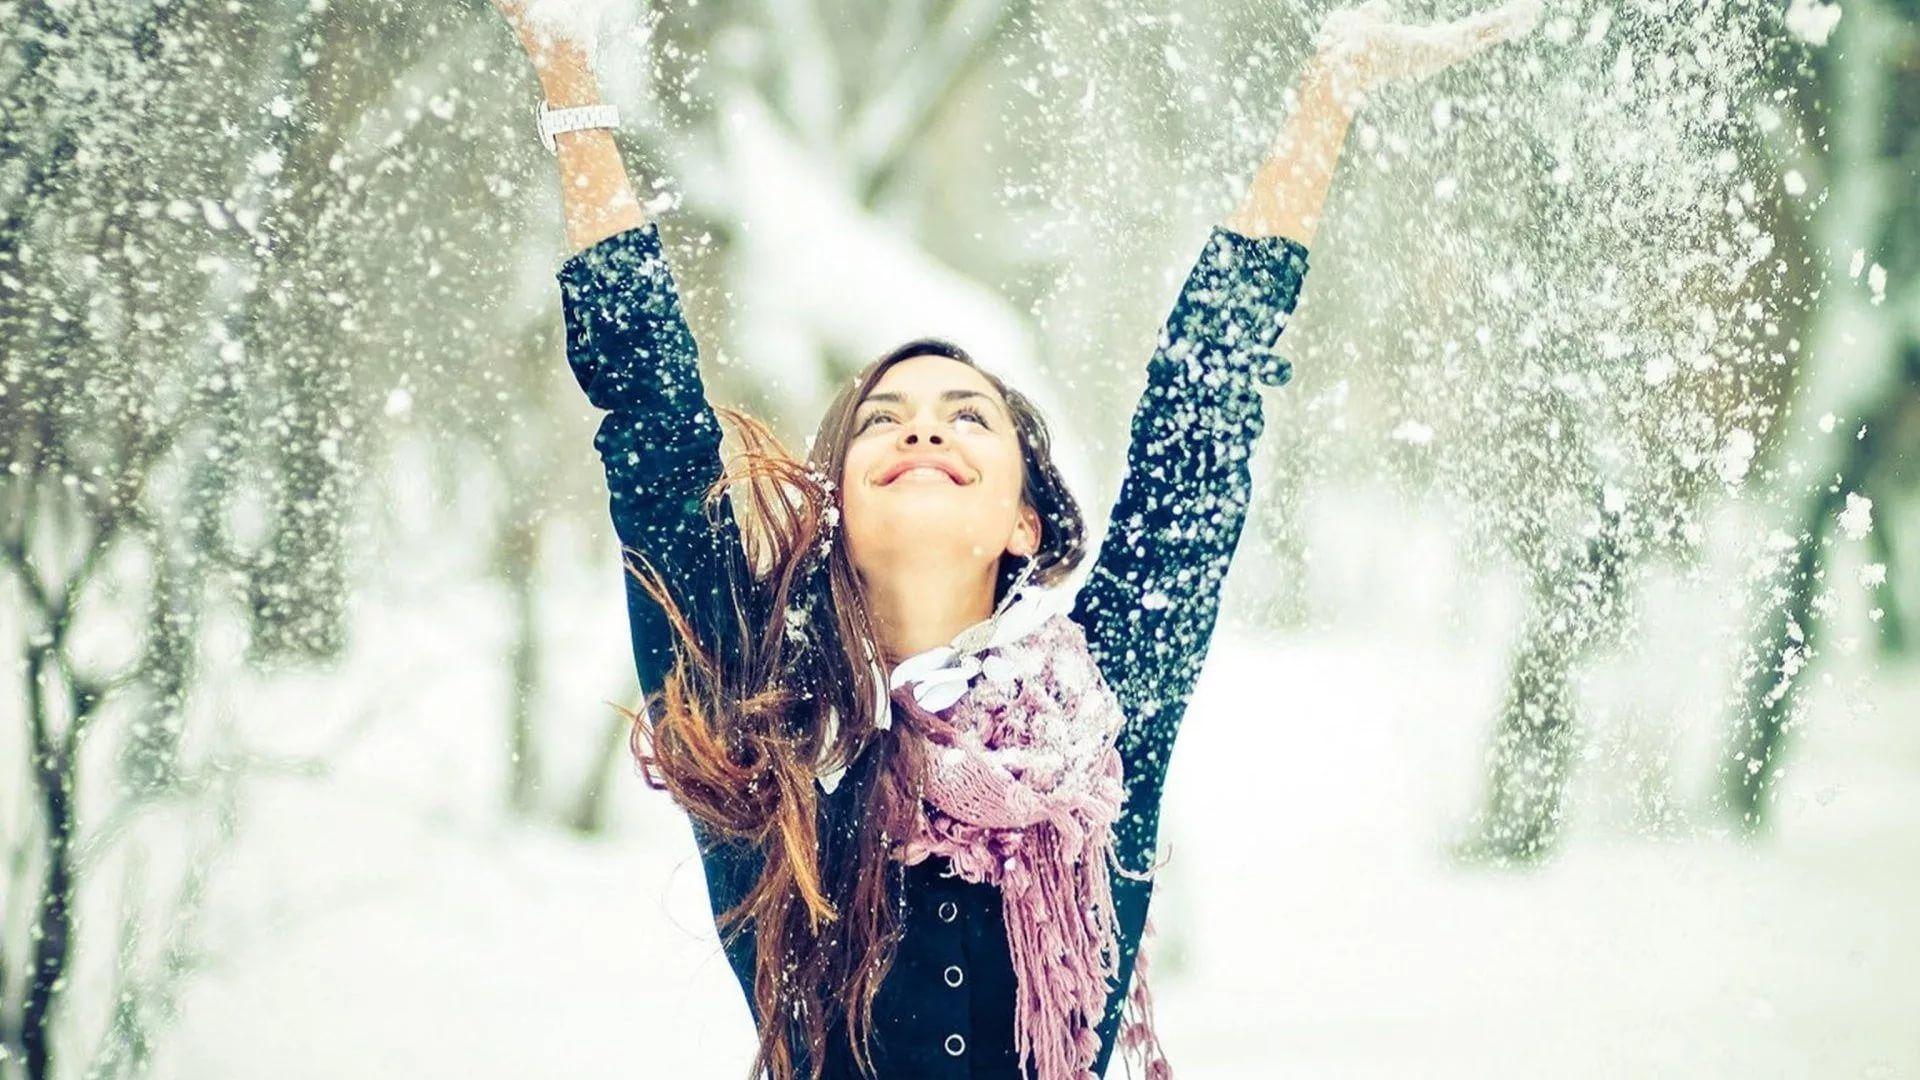 Happy Winter screen wallpaper